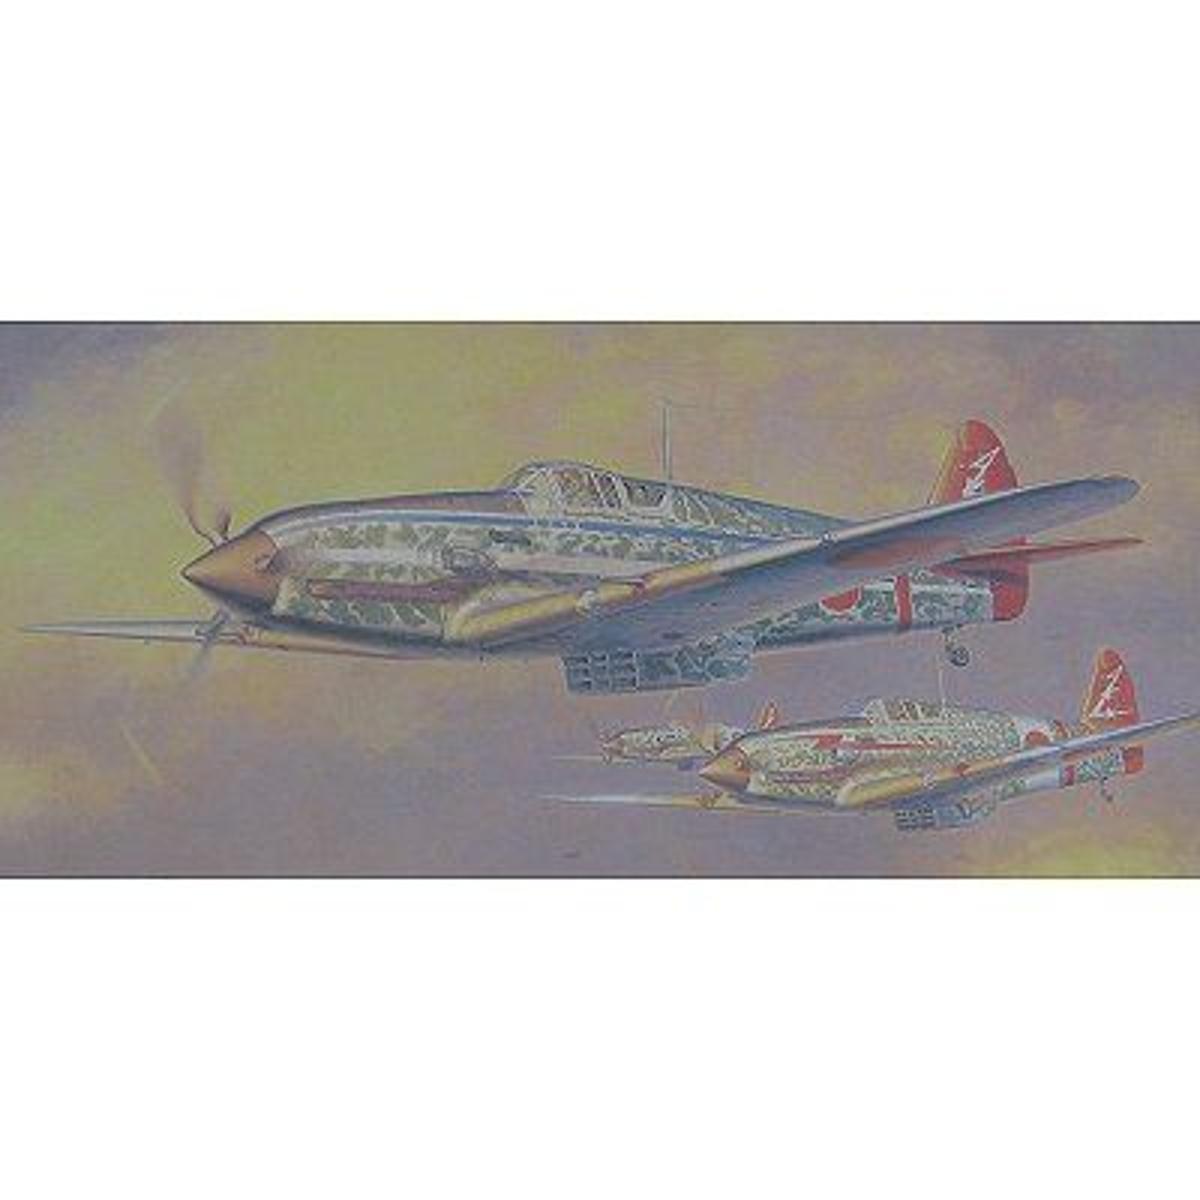 Maquette avion: Kawasaki KI611-I Hien (Tony)